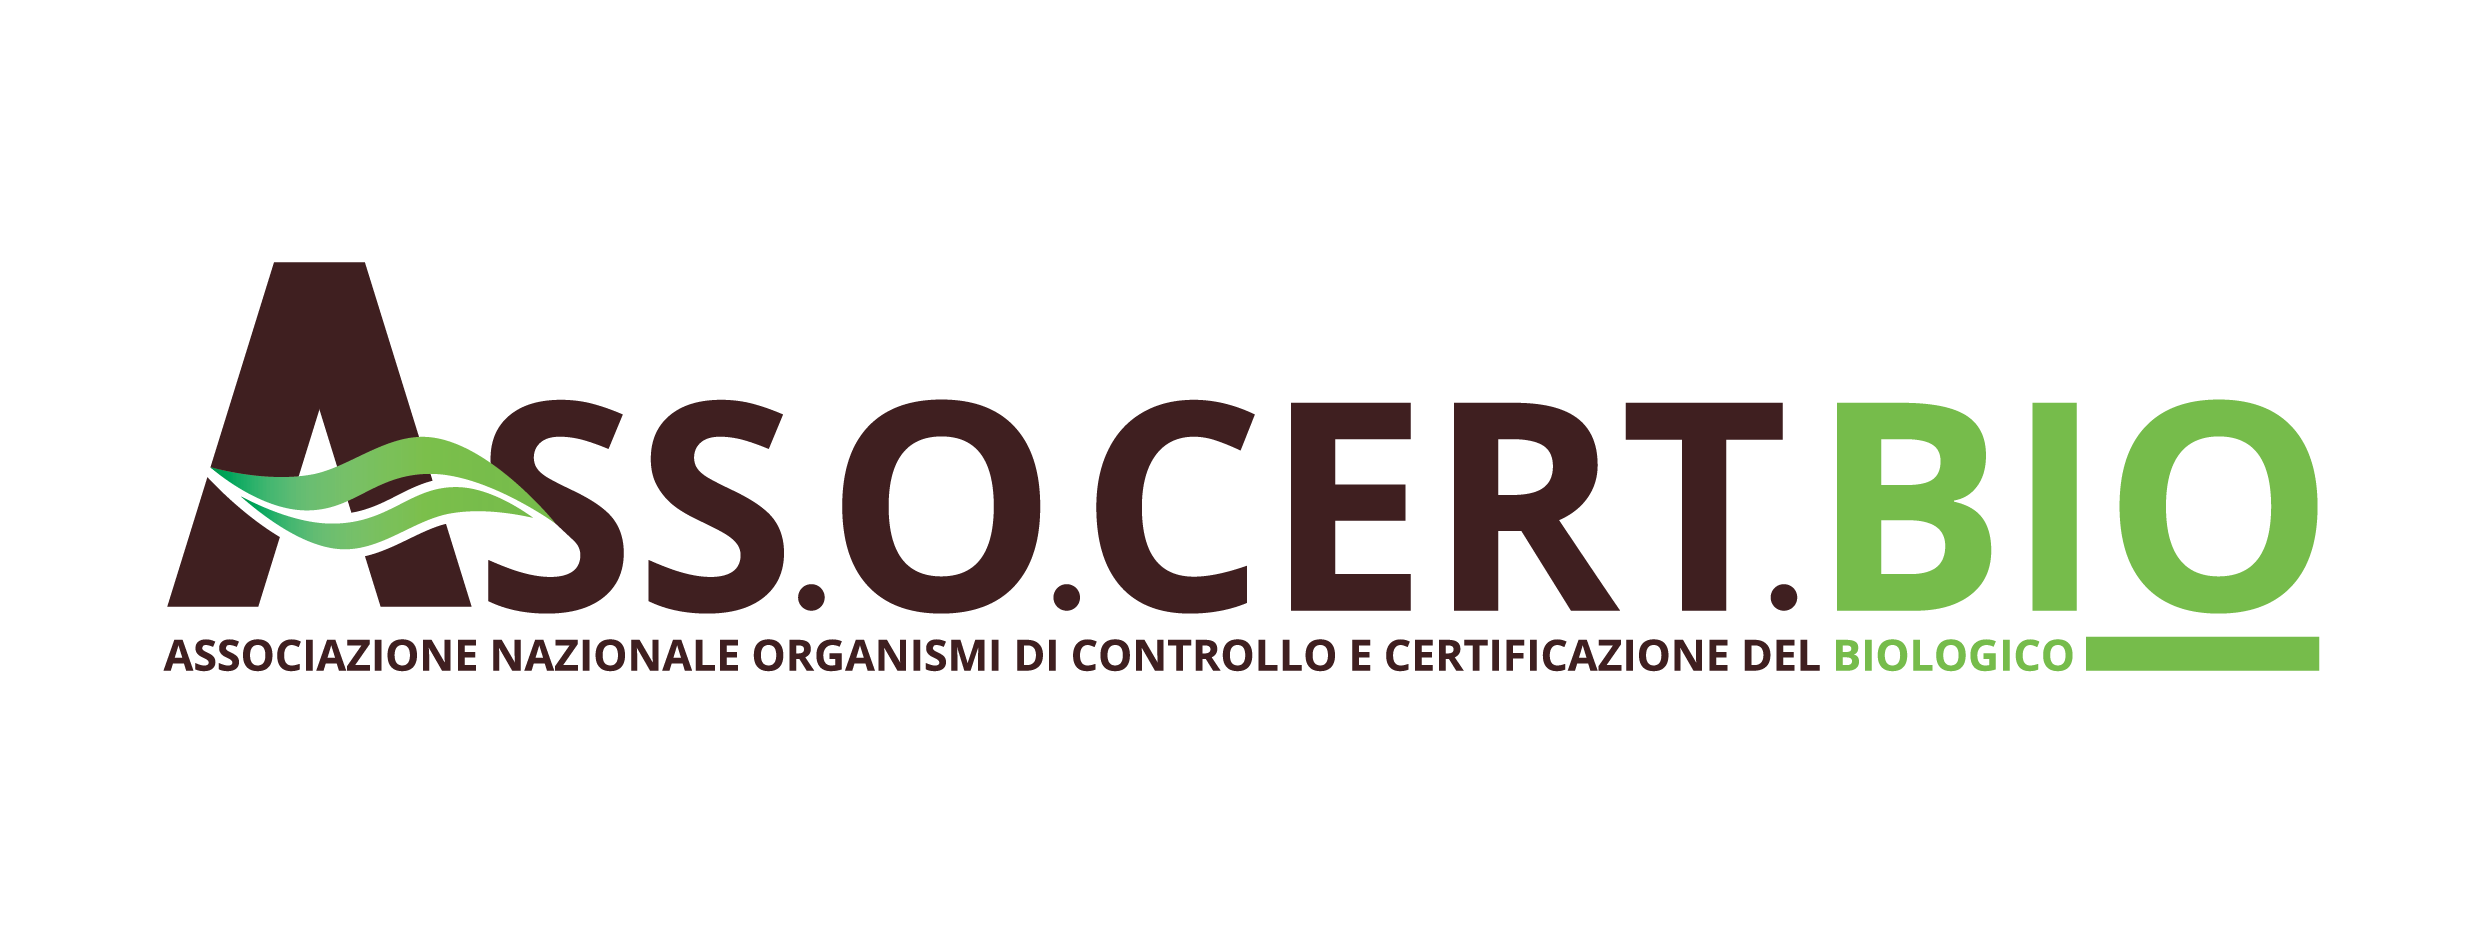 LOGO DEF ASSOCERT BIO_POSITIVO